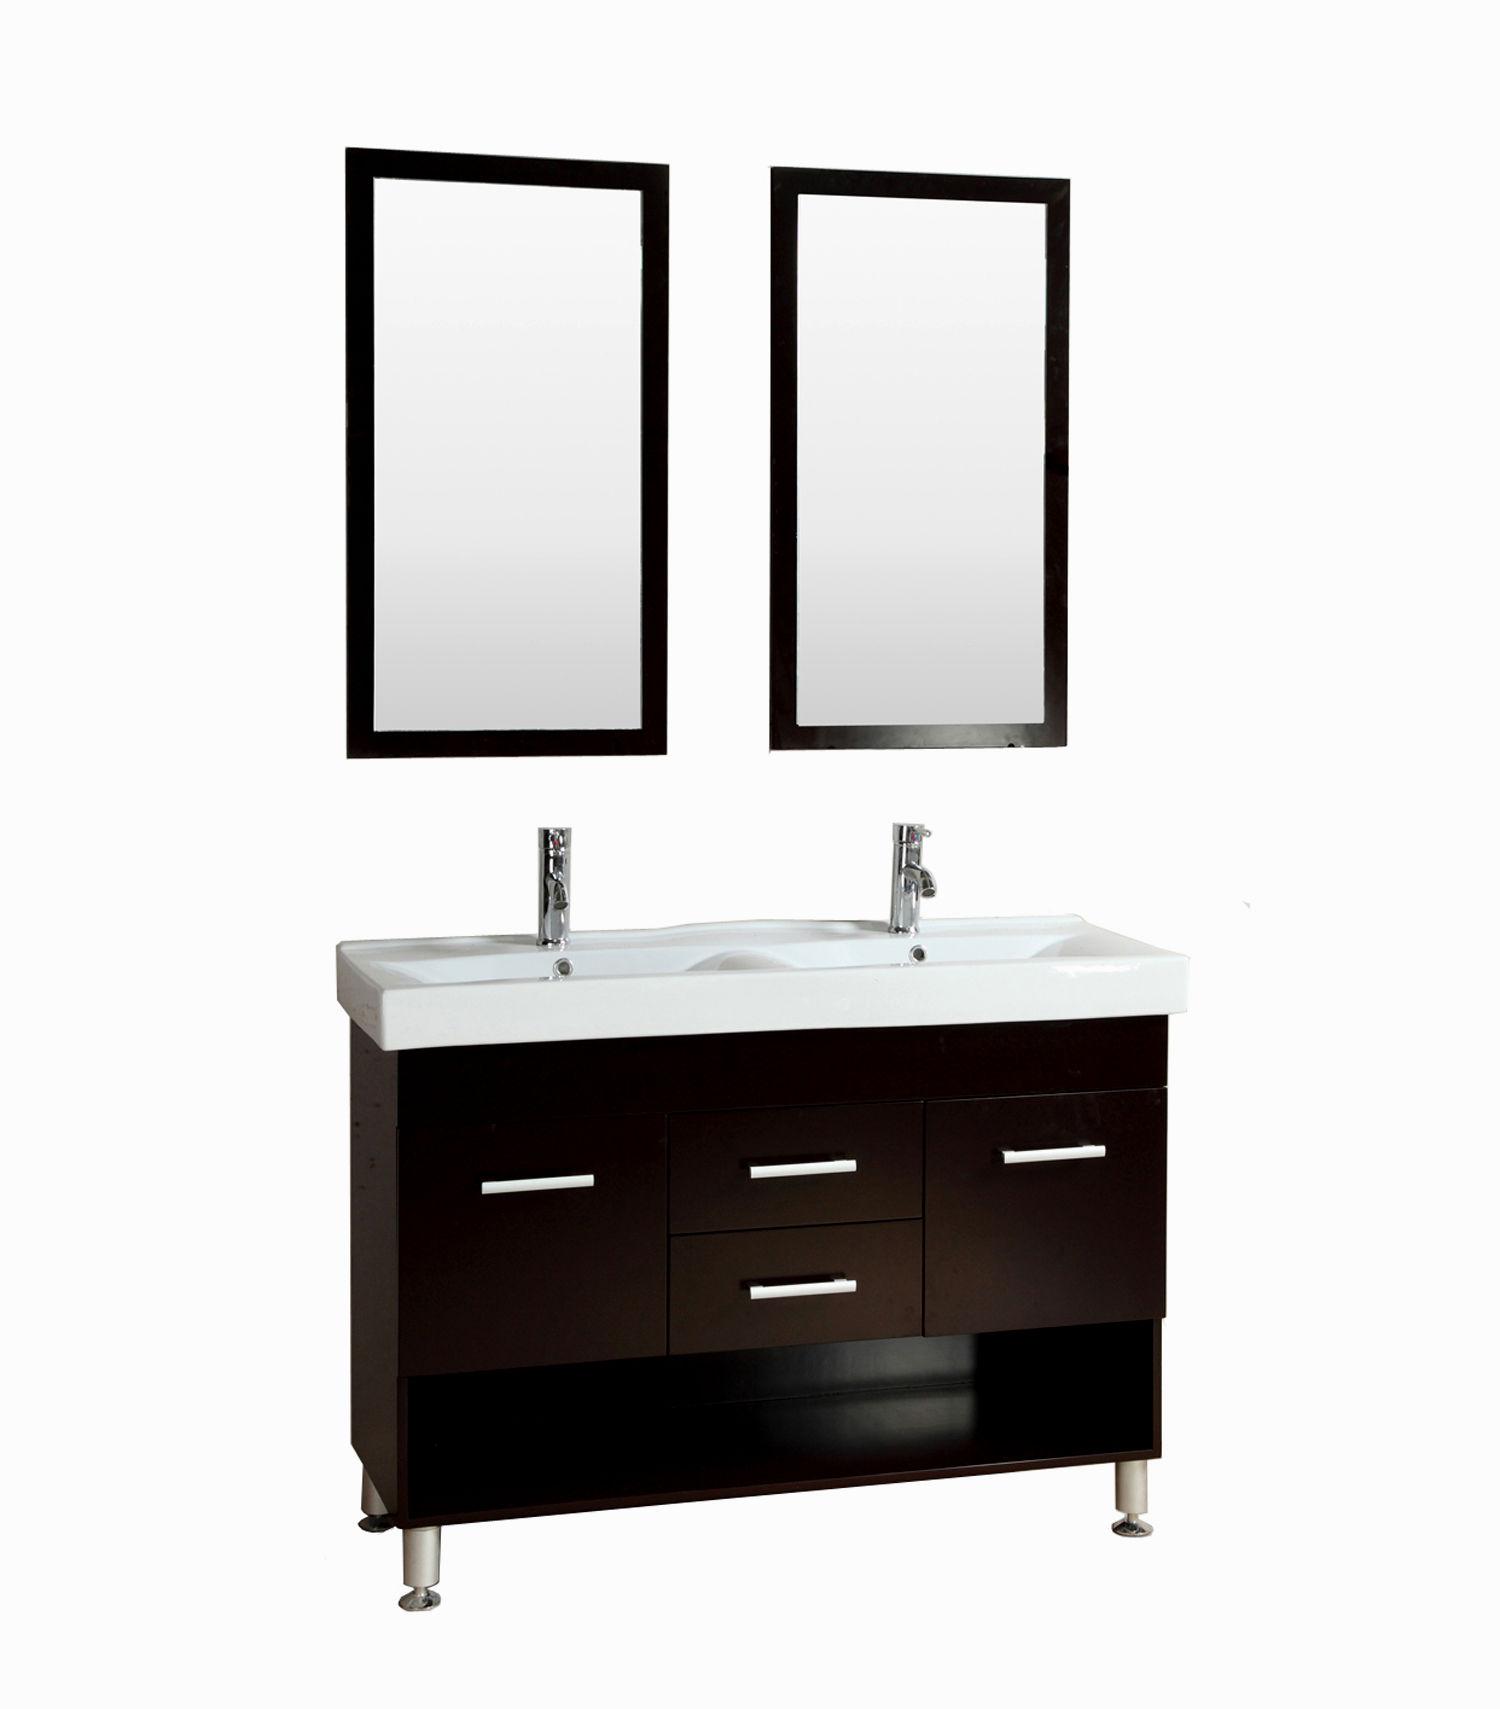 fresh bathroom vanity mirror construction-Beautiful Bathroom Vanity Mirror Inspiration